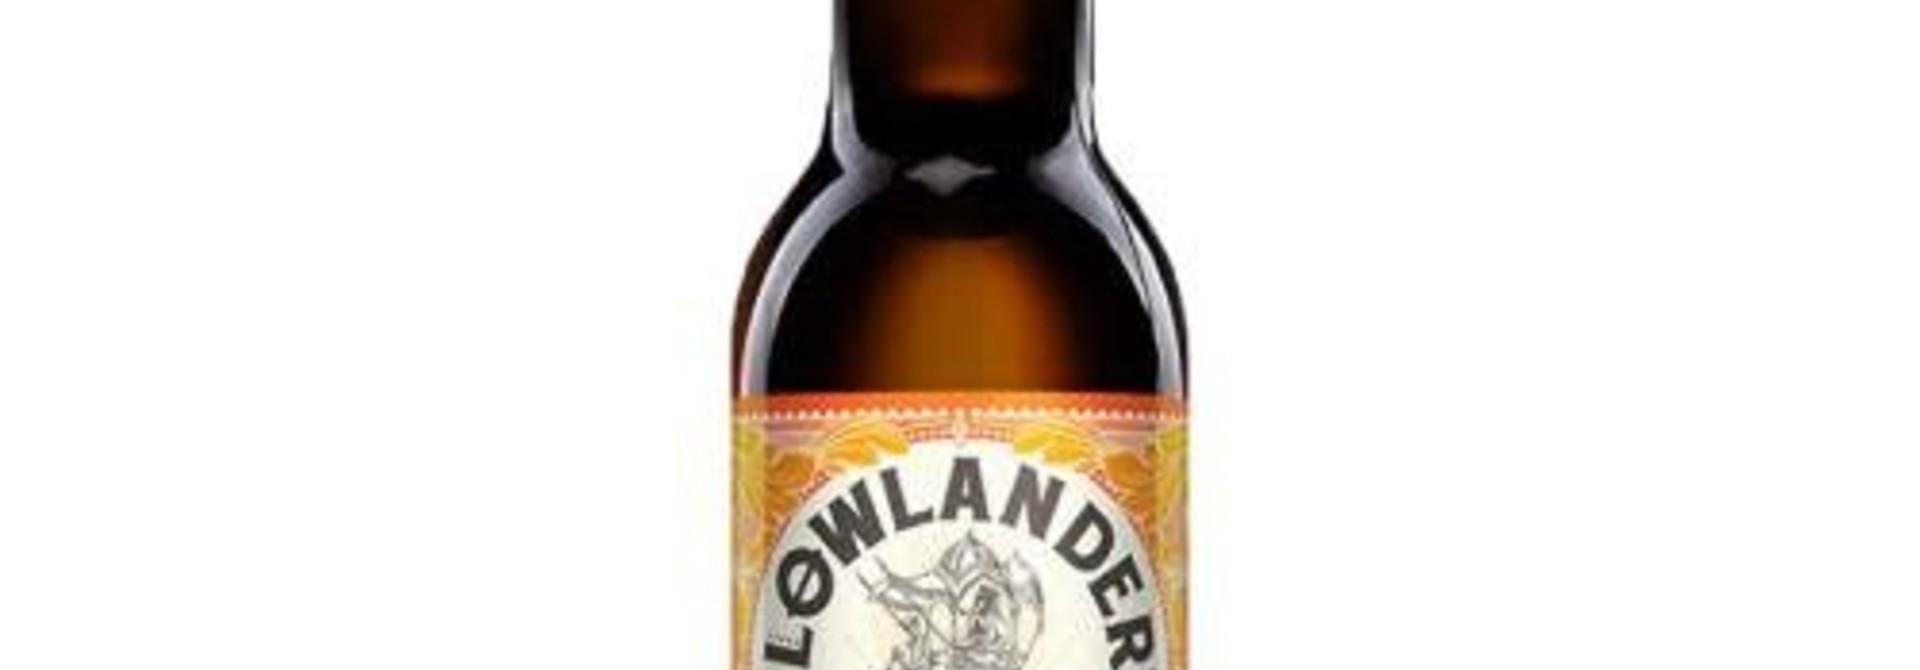 LOWLANDER - IPA 0.3 33CL